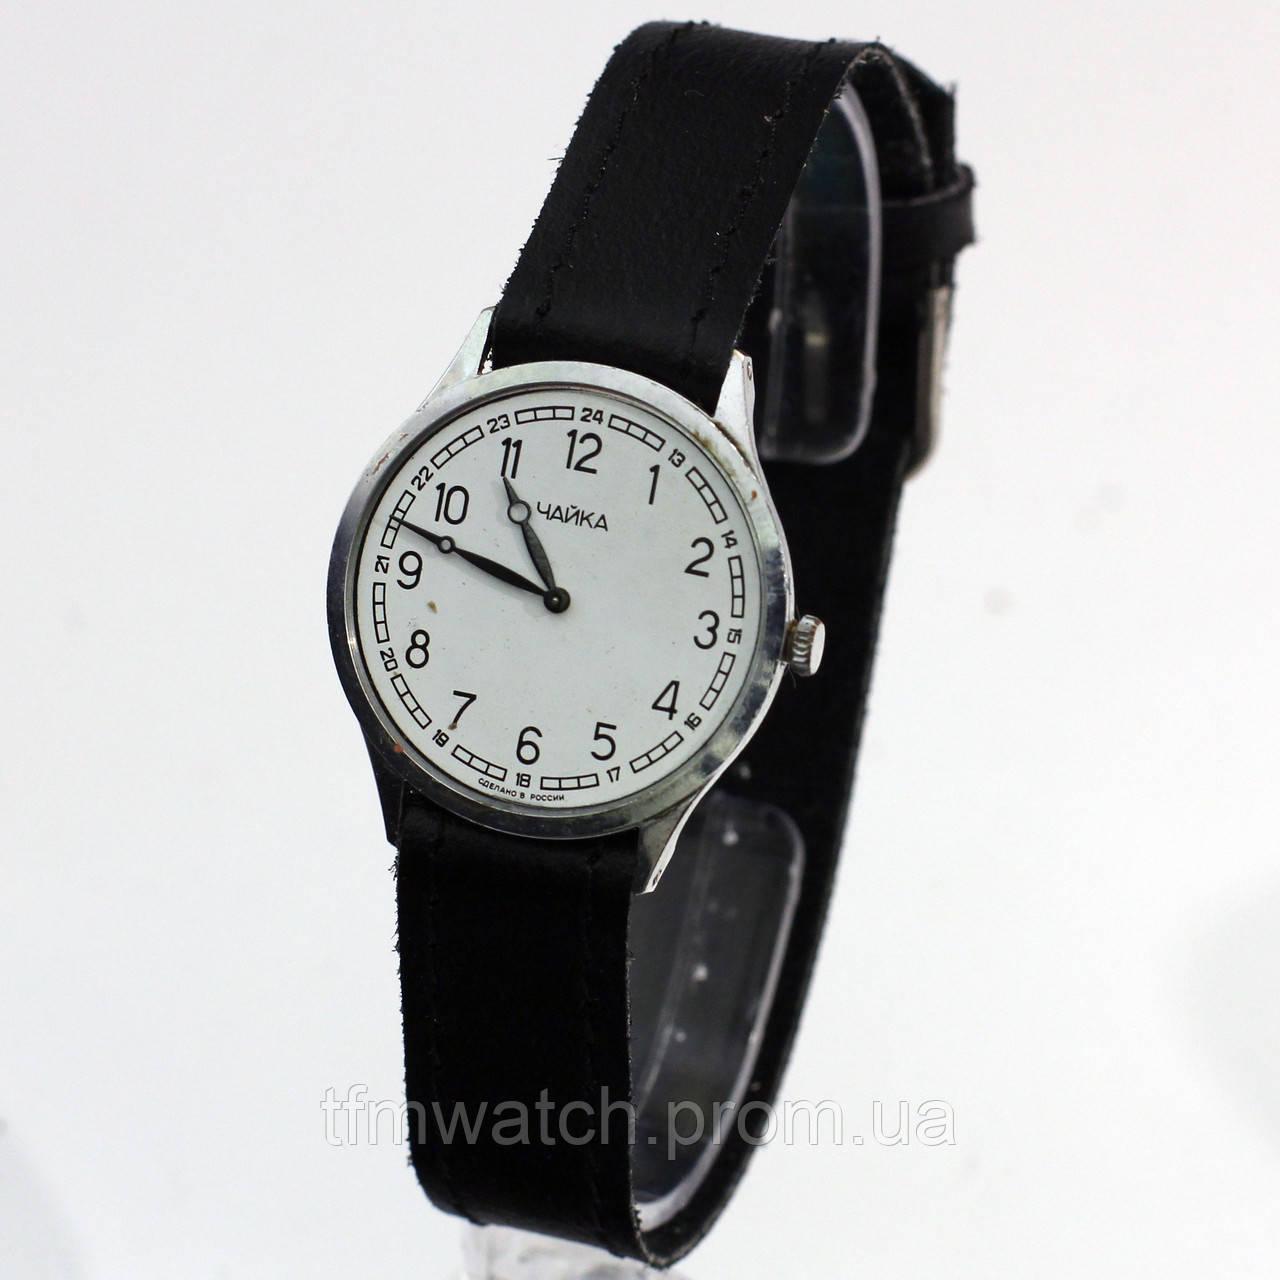 Часы Чайка Россия